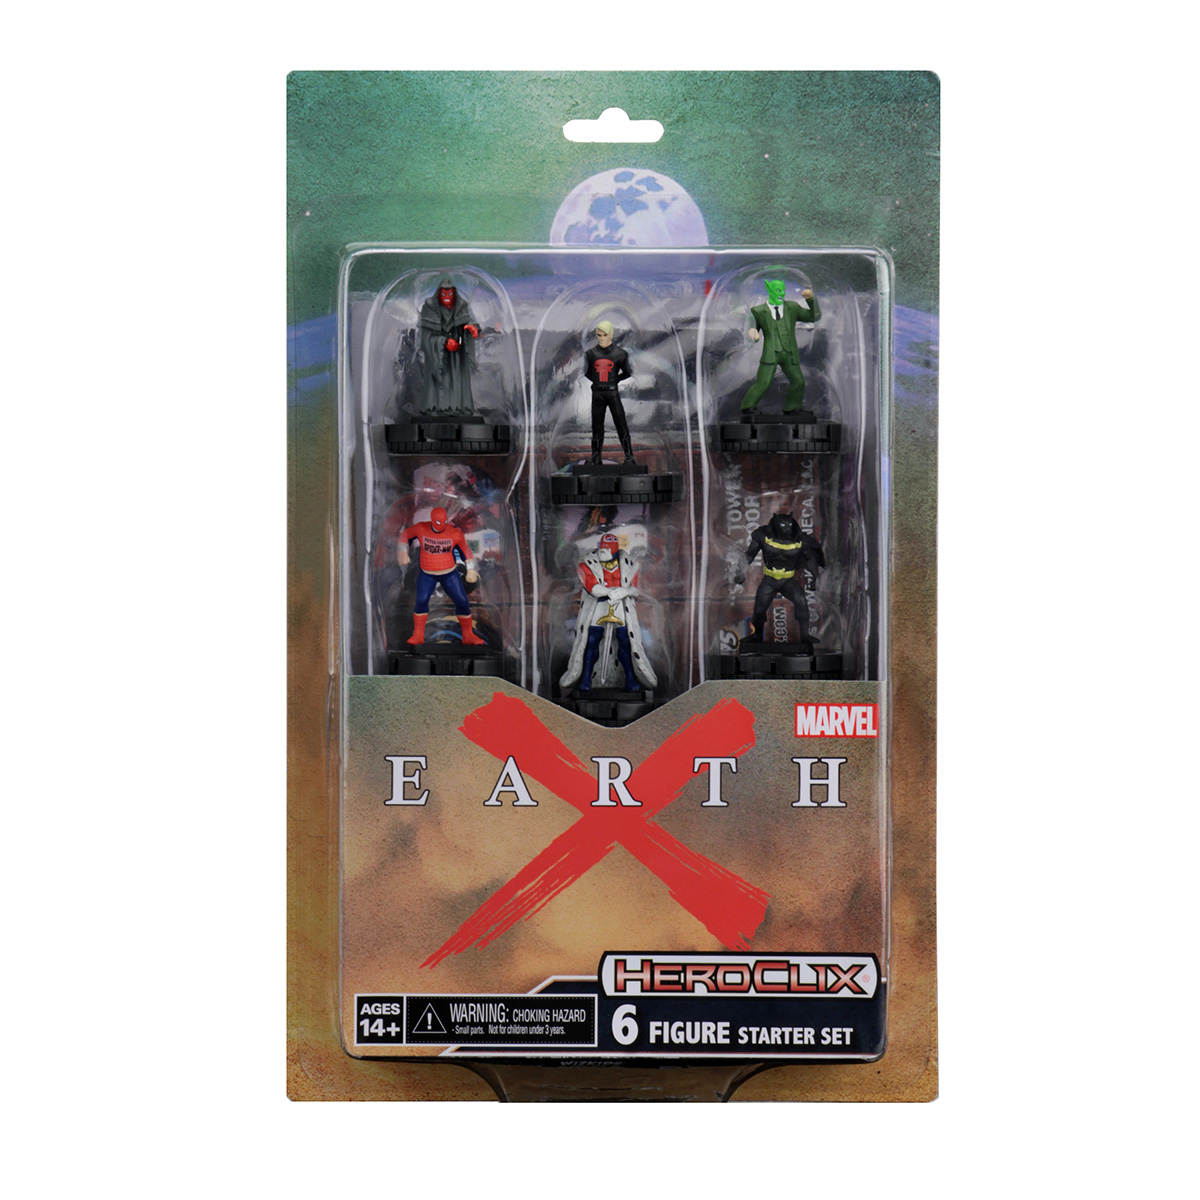 Marvel HeroClix: Earth X